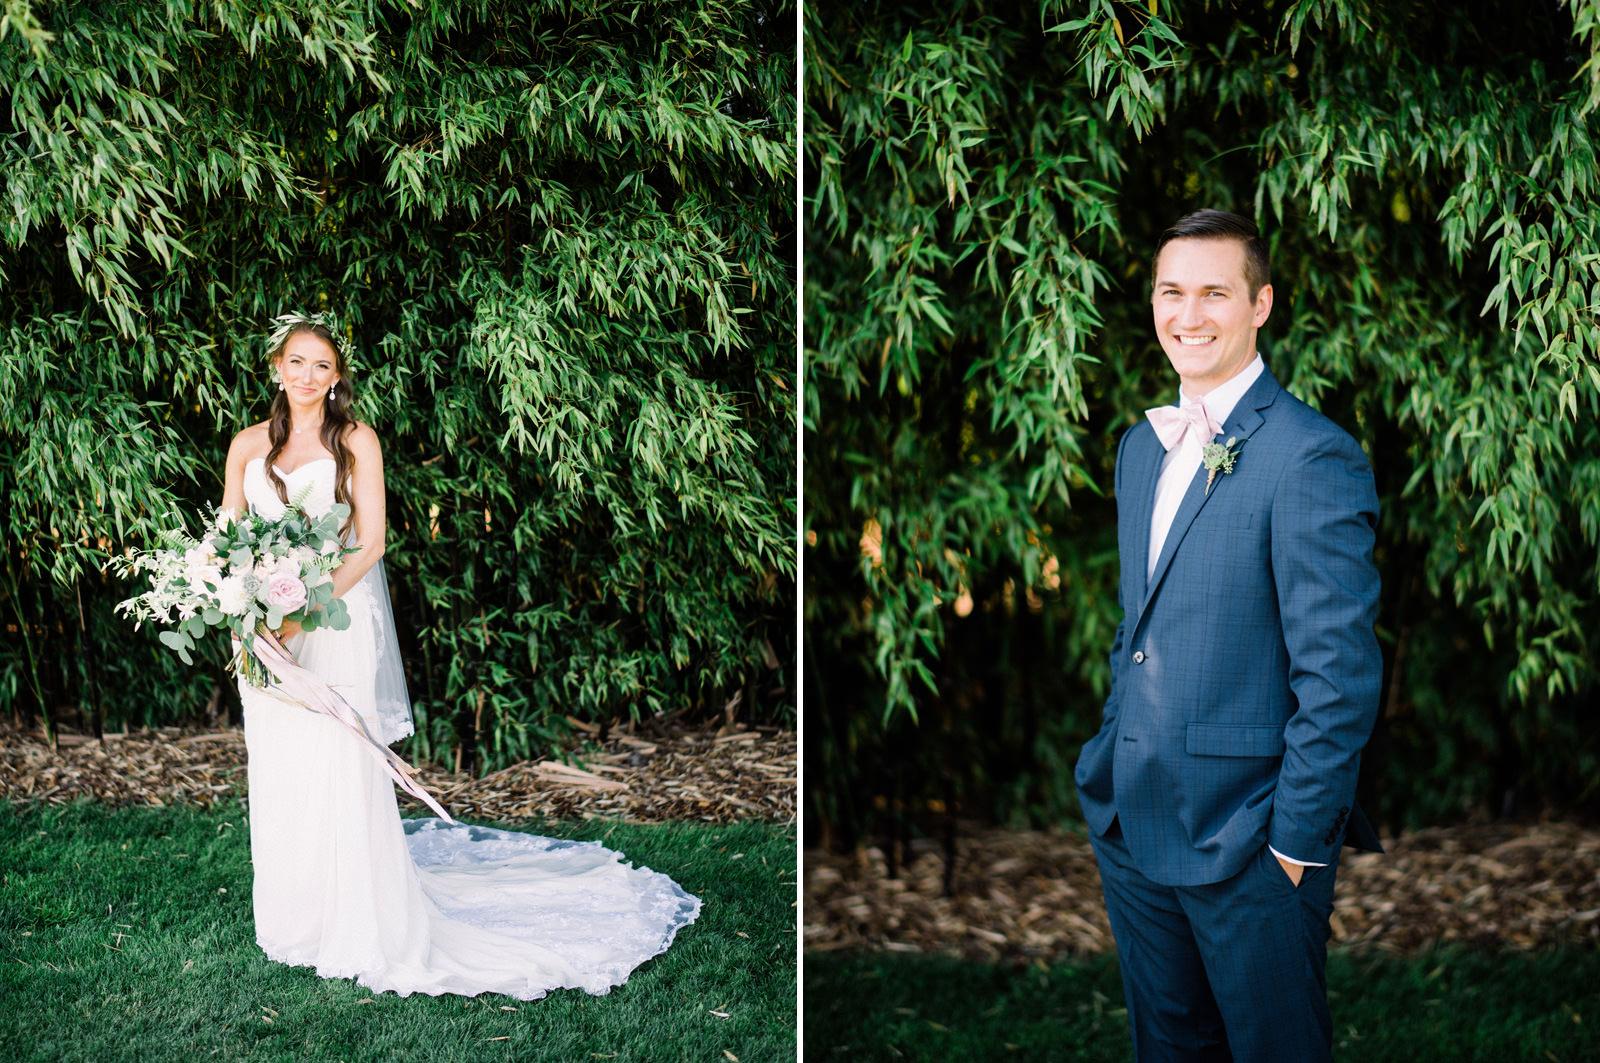 032-woodinville-lavendar-farm-wedding-with-golden-glowy-photos.jpg